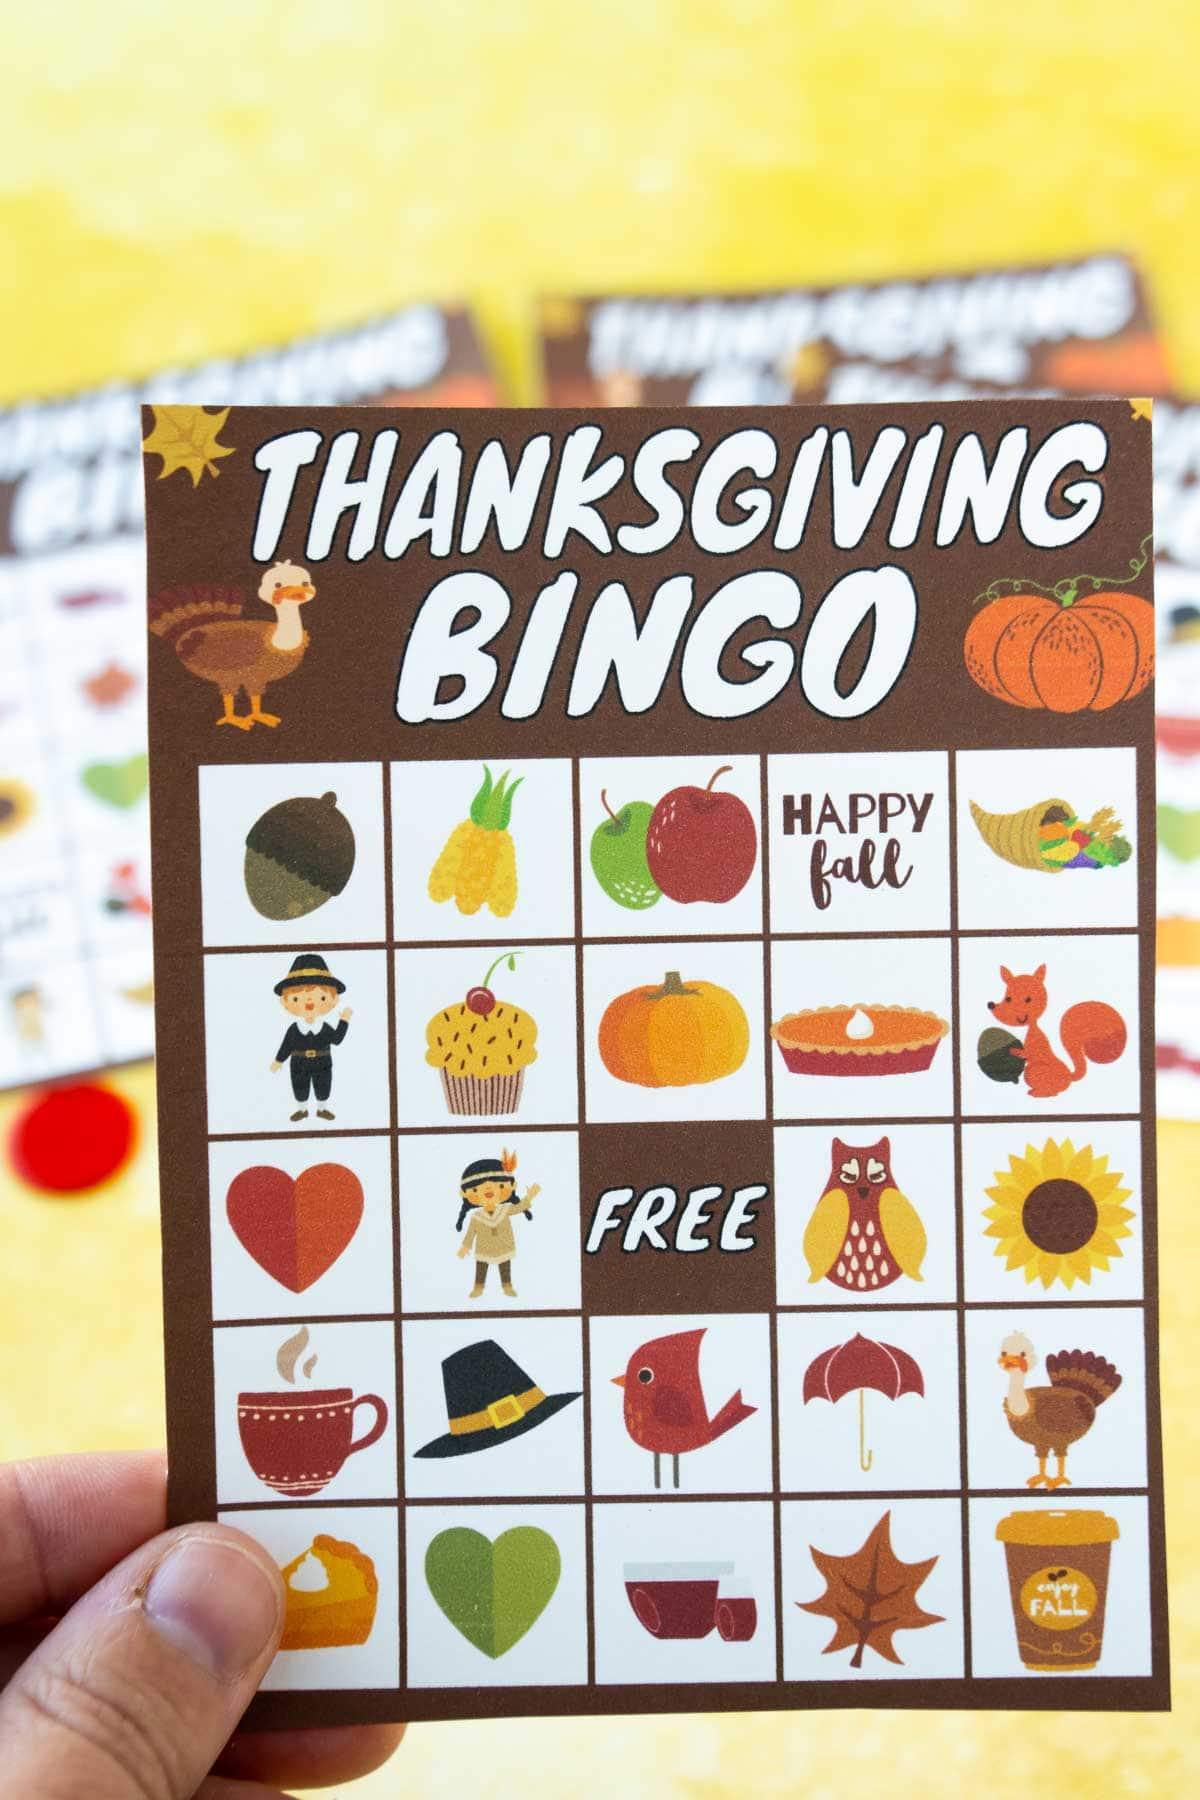 Woman's hand holding a Thanksgiving bingo card